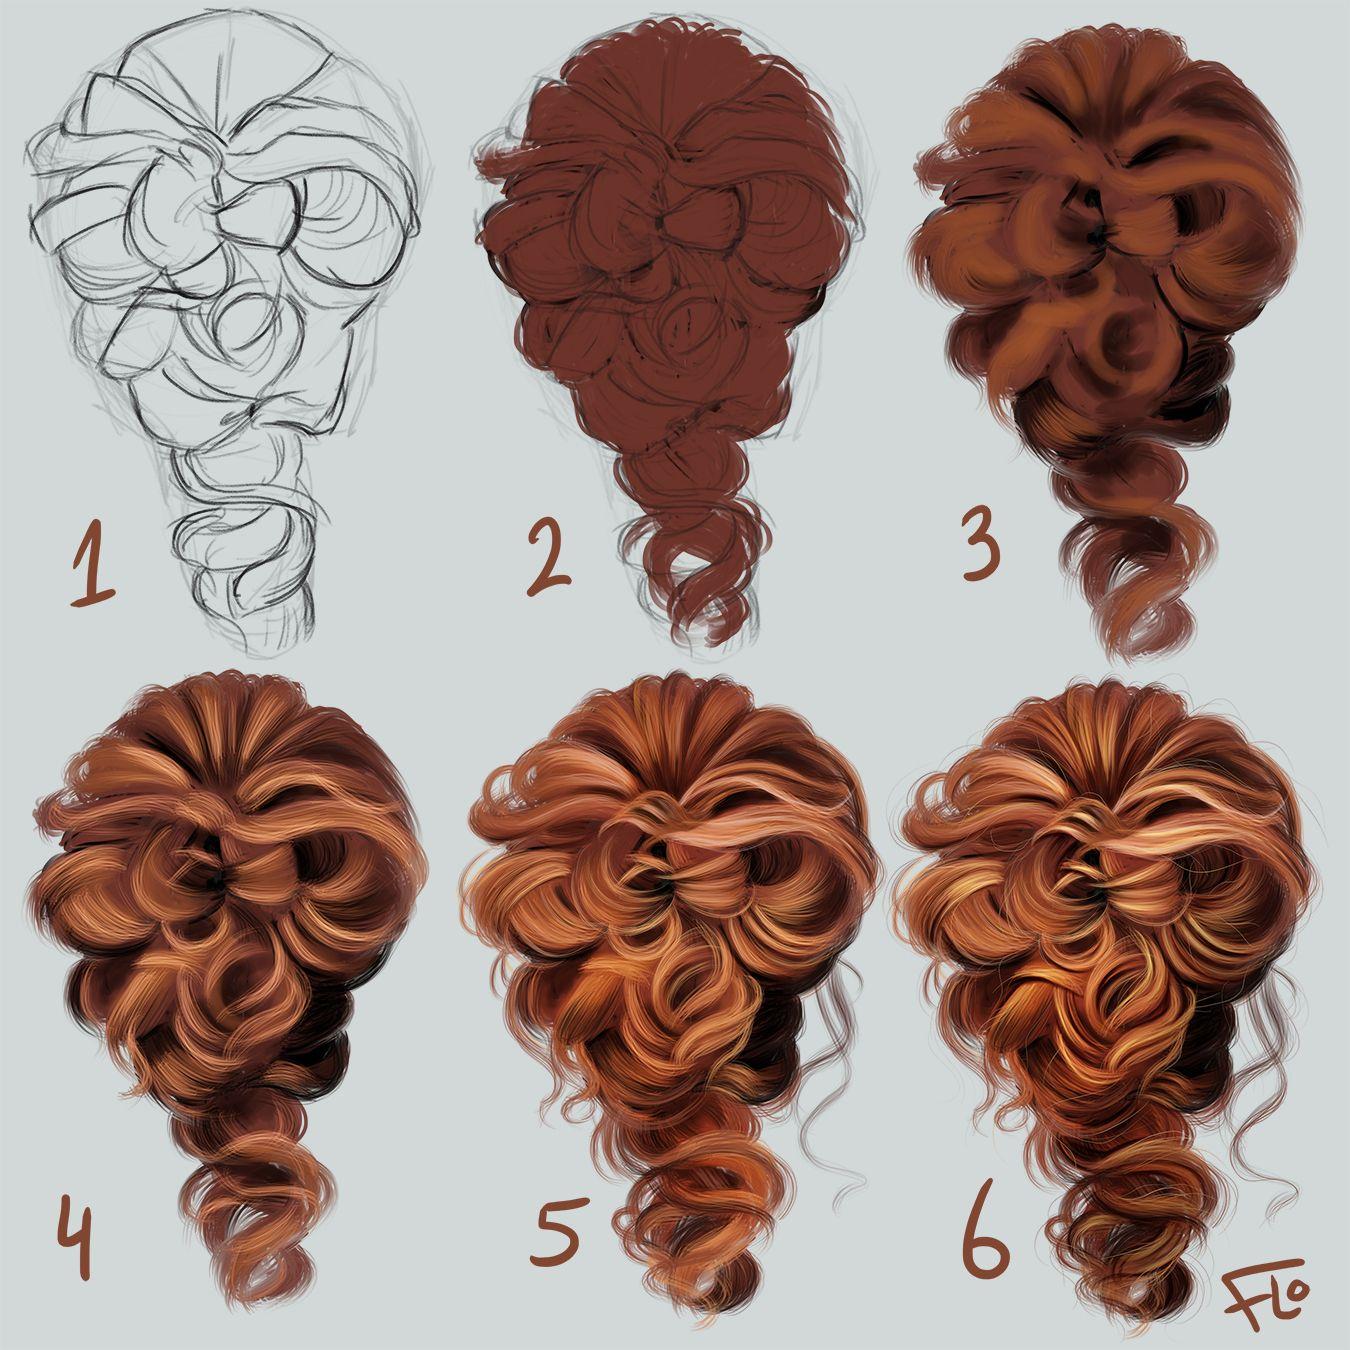 Digital Drawing Hair Step By Step Procreate Ipad Art How To Draw Hair Digital Painting Tutorials